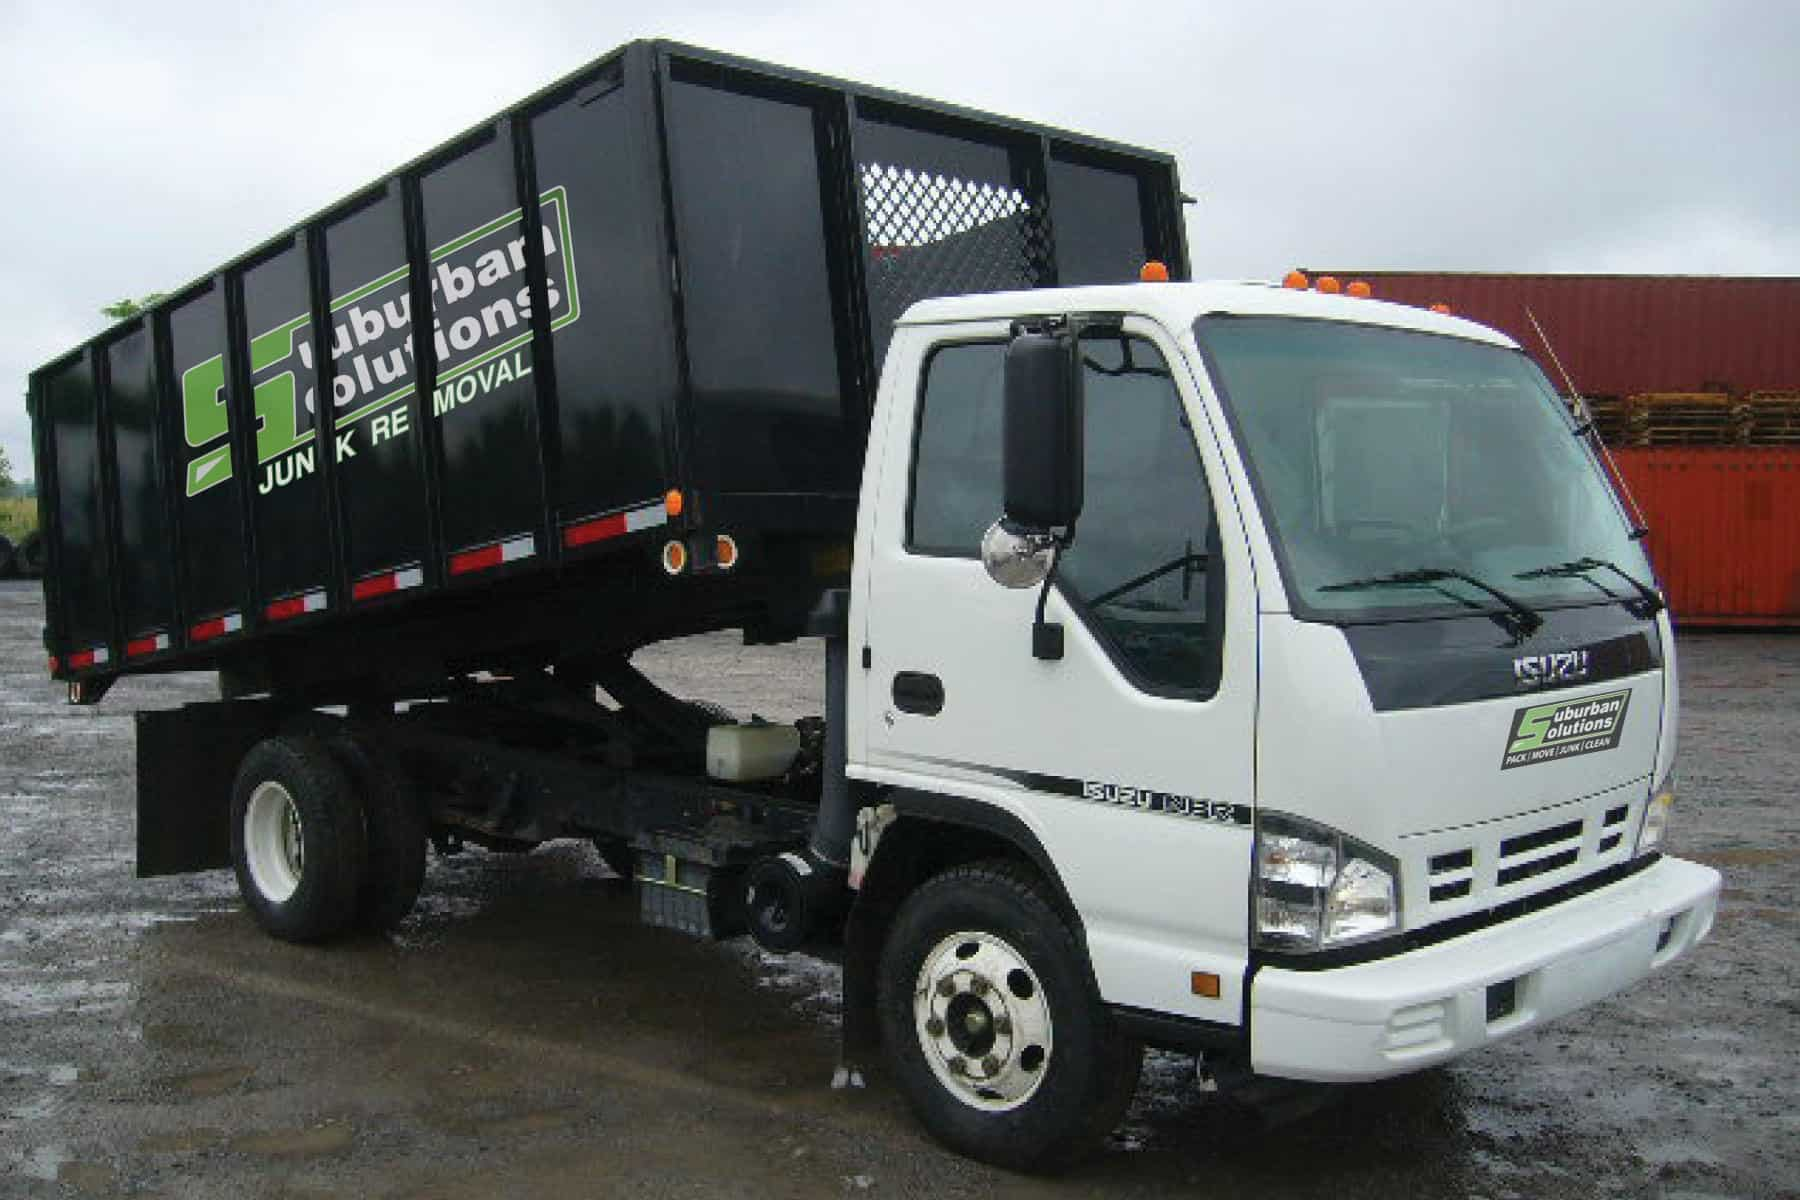 Suburban Solutions' dump truck unloading junk we've collected